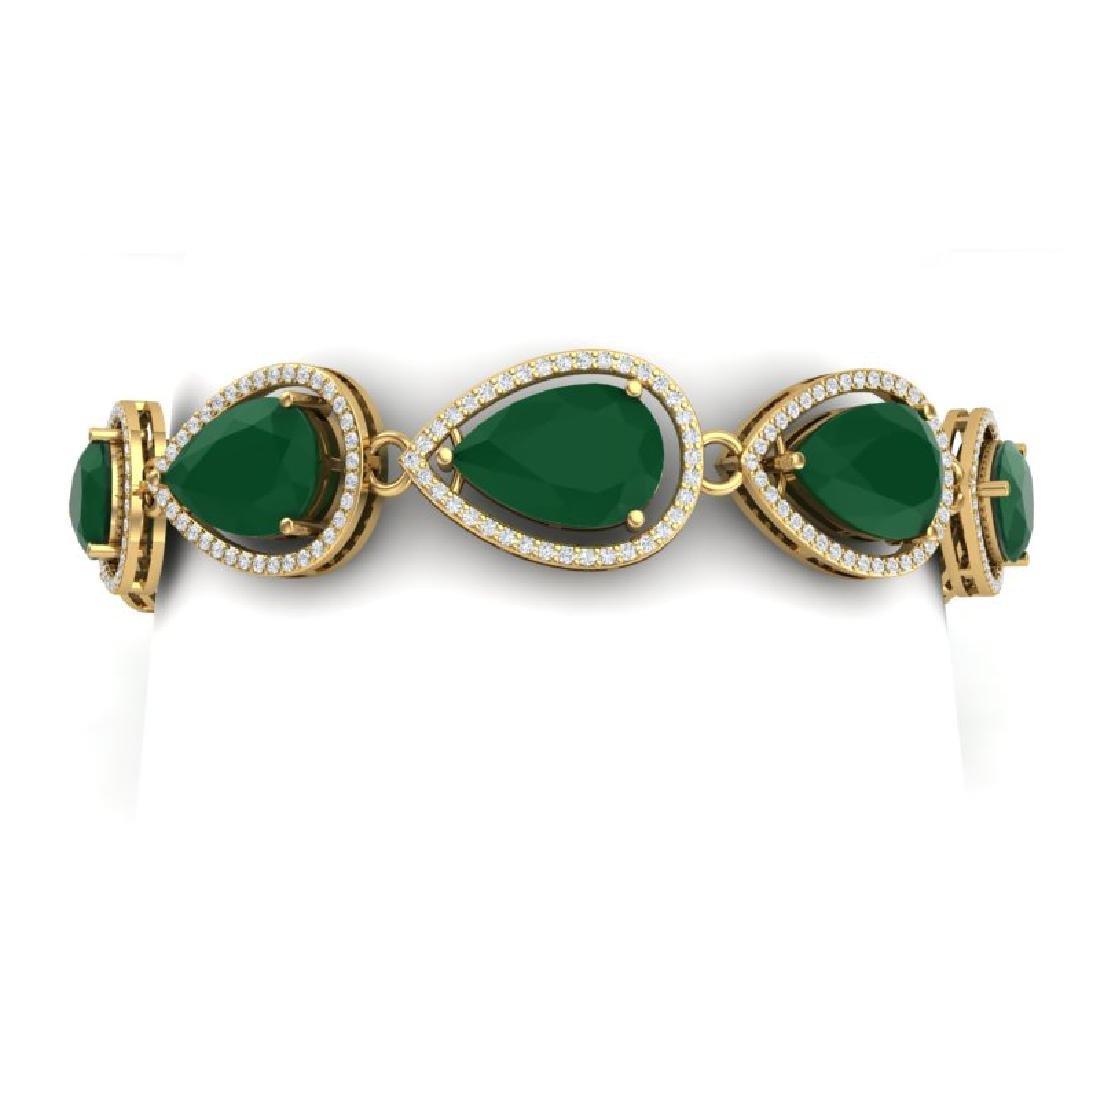 28.31 CTW Royalty Emerald & VS Diamond Bracelet 18K